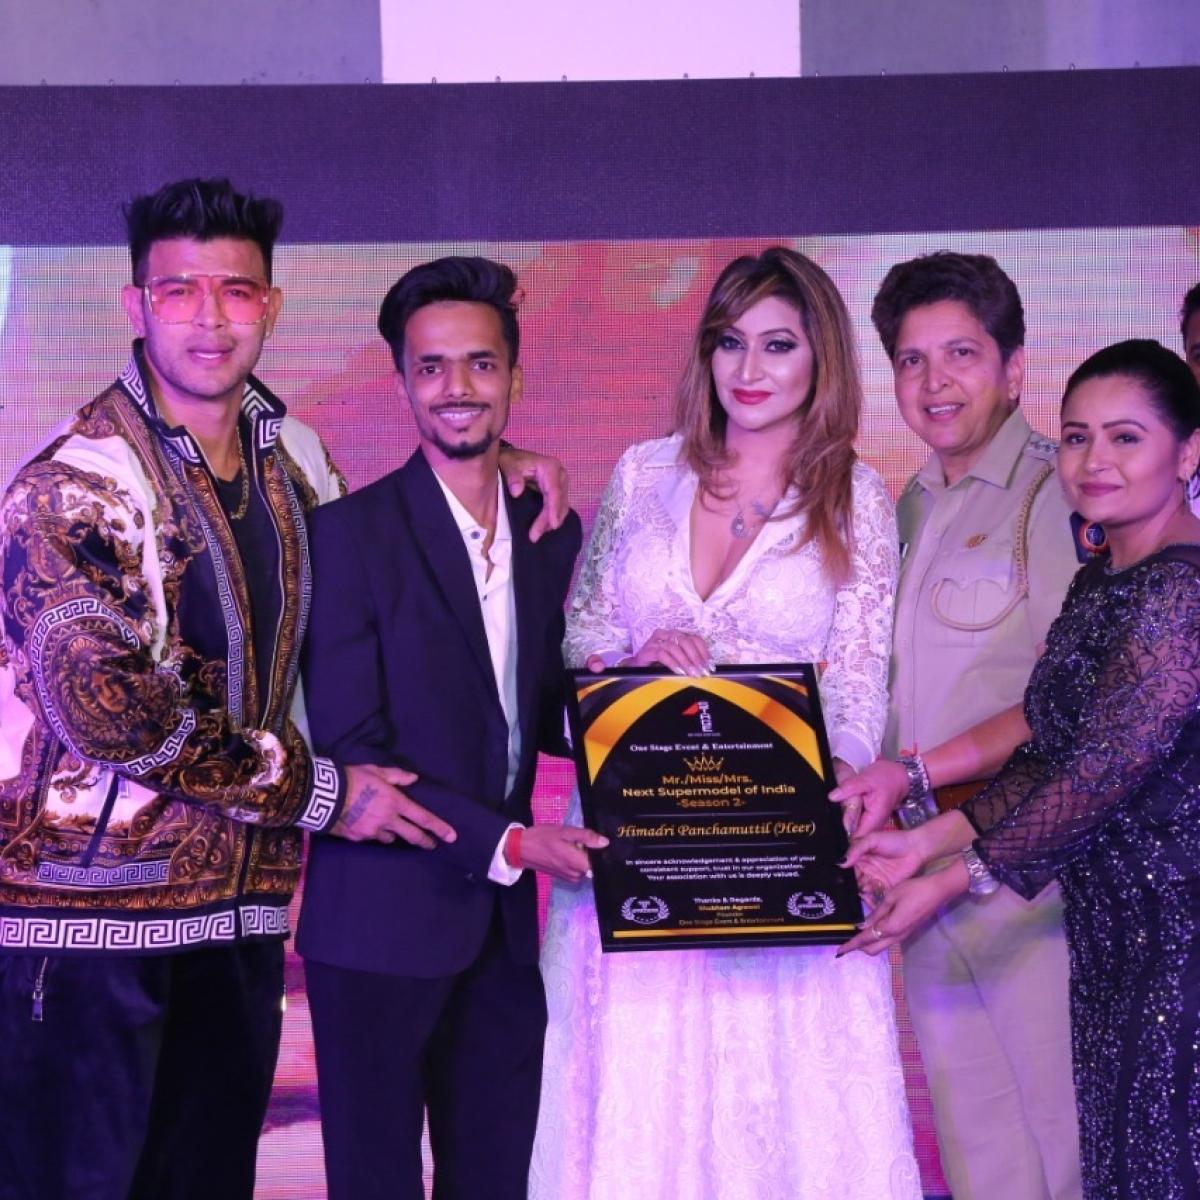 Pune: Next Supermodel of India - Season 2